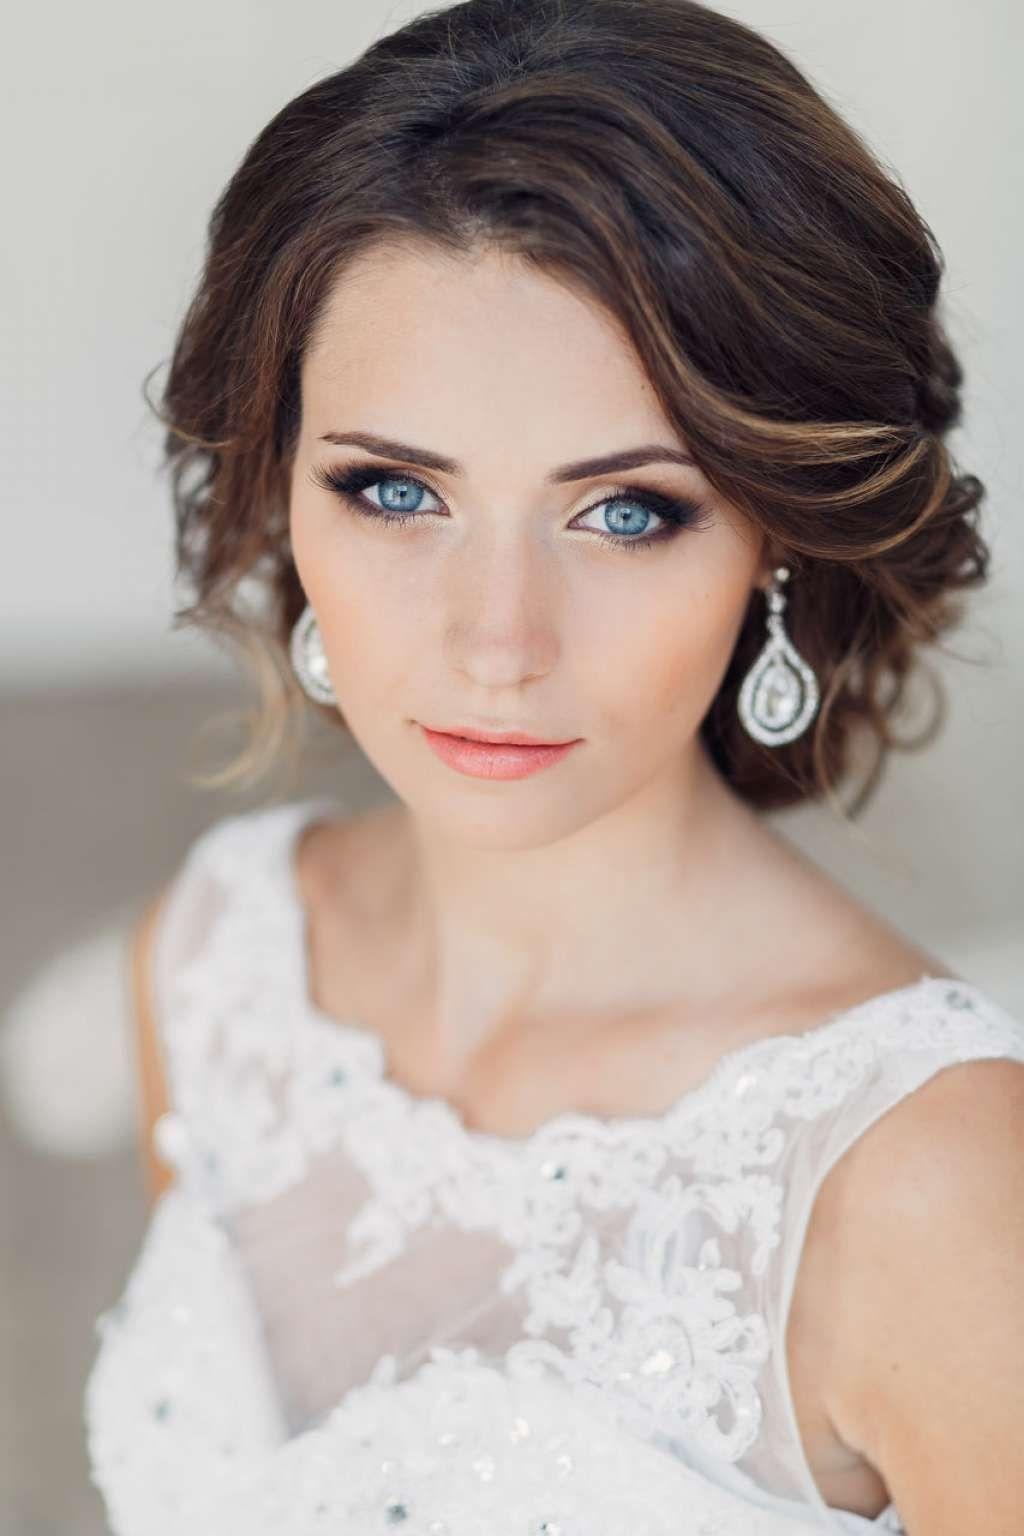 makeup ideas for blue eyes and black hair - wavy haircut